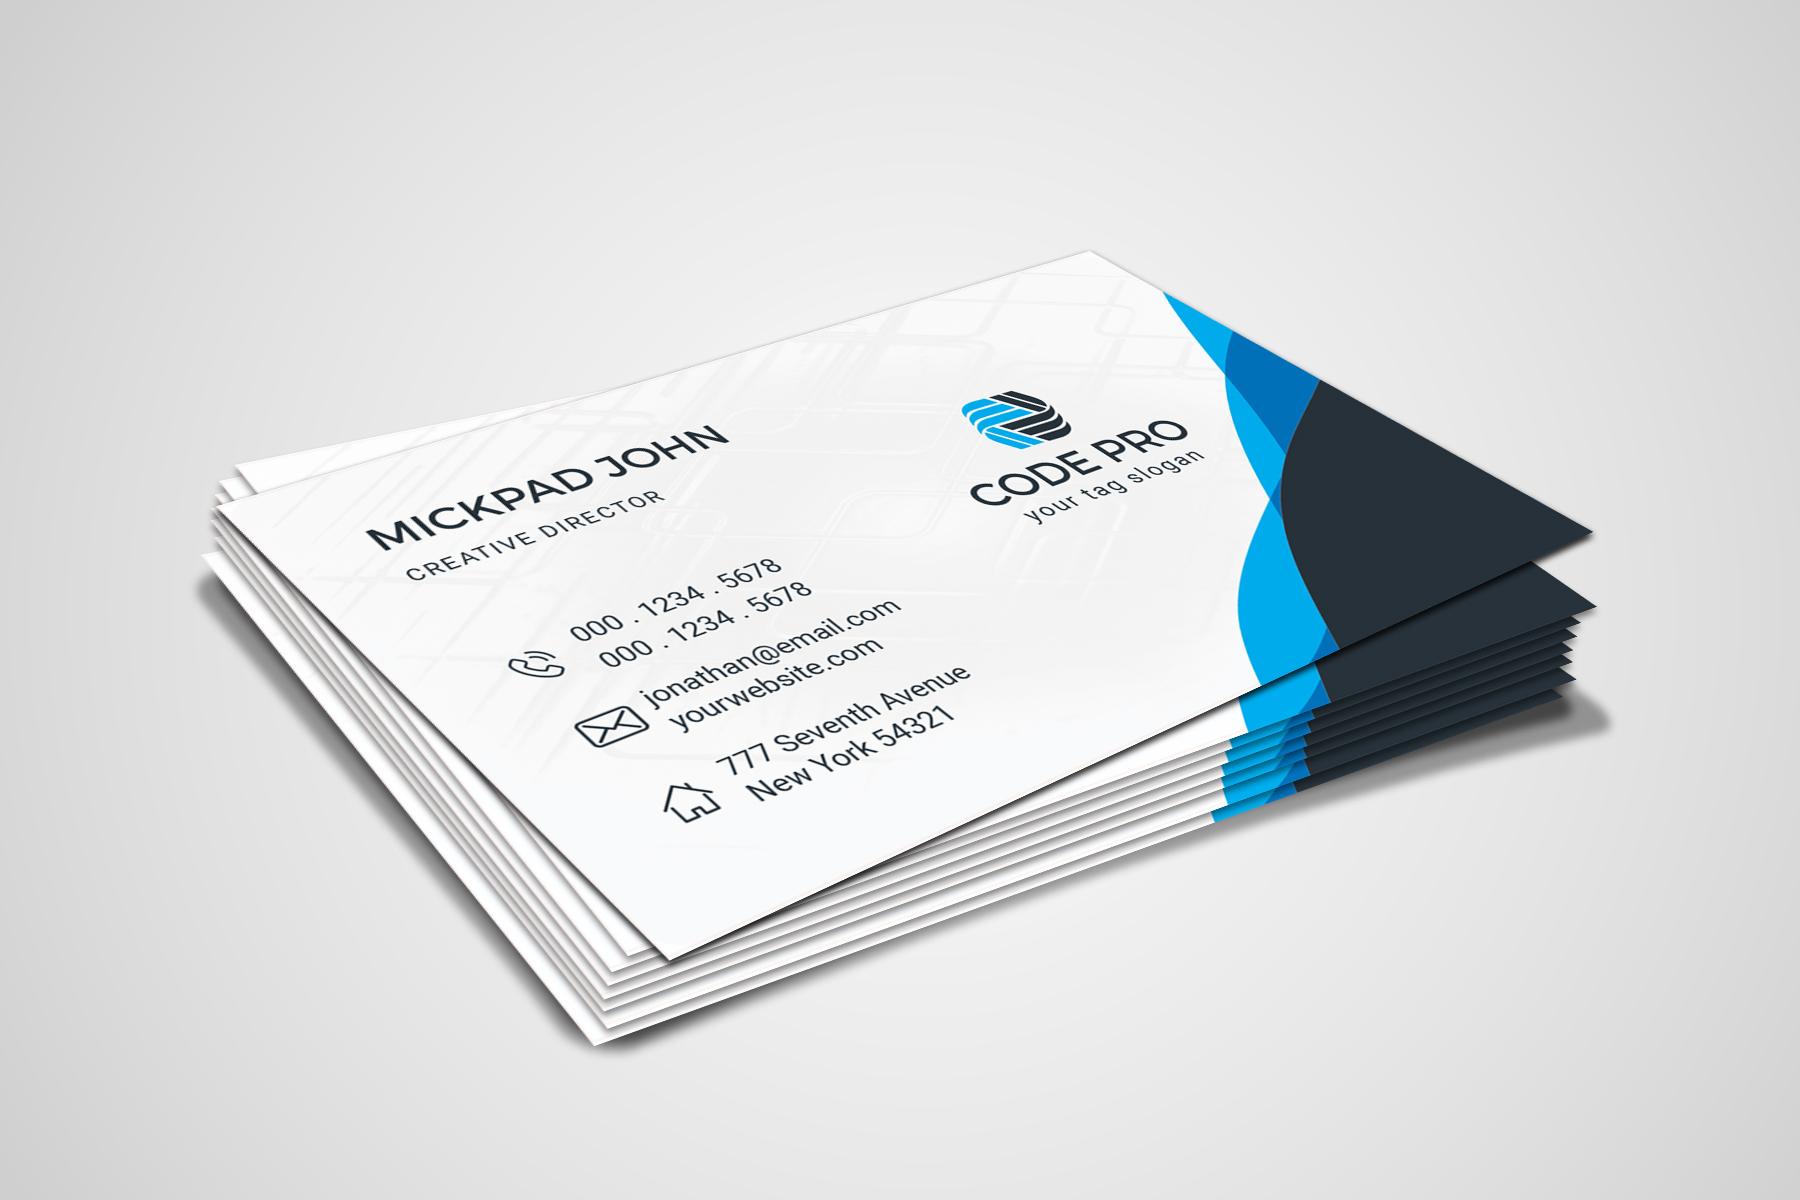 Code Pro Business Card vol. 1 Corporate Identity